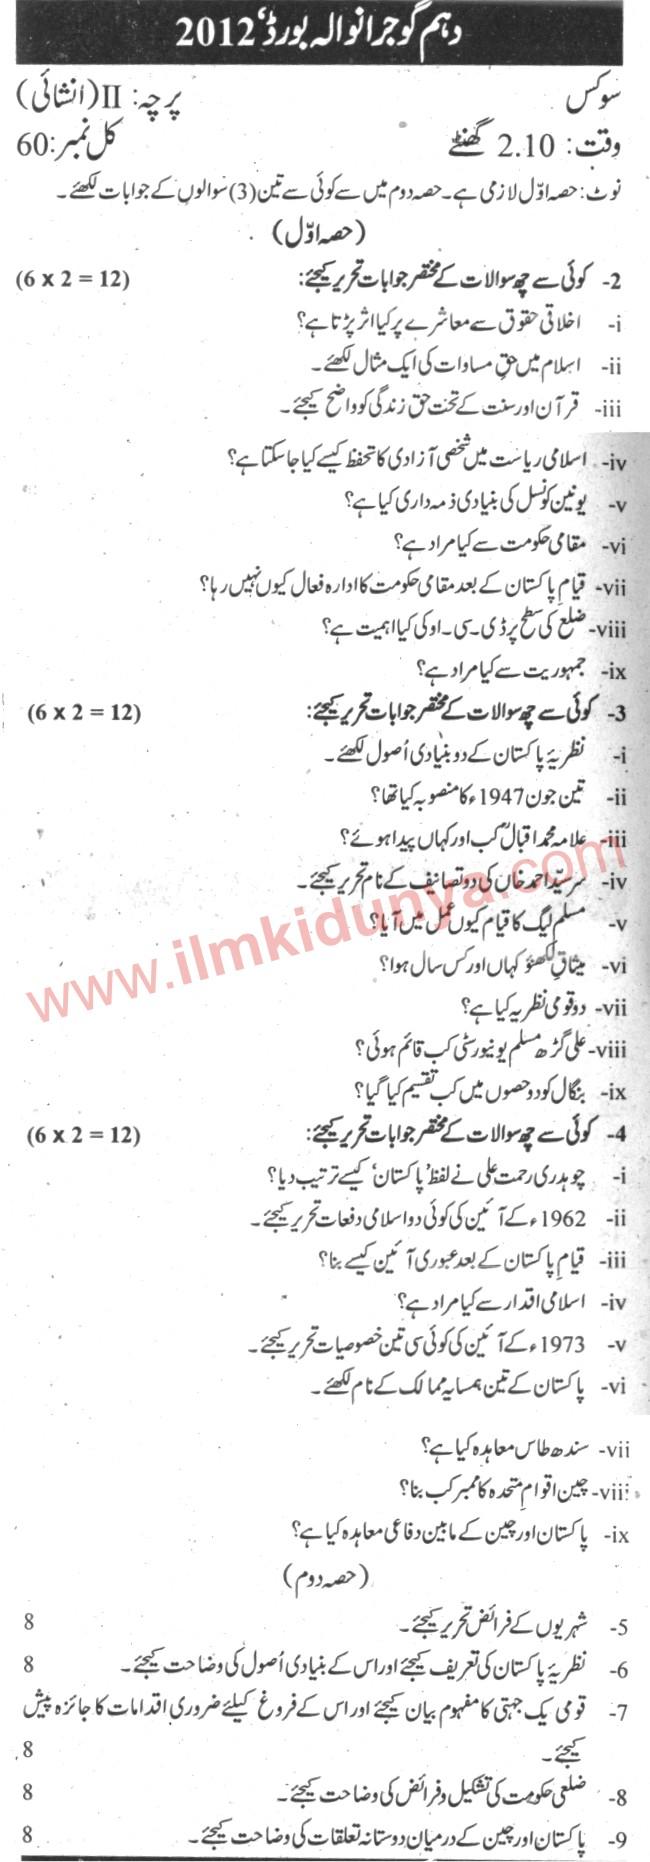 Gujranwala Board Civics 10th Class Past Paper 2012